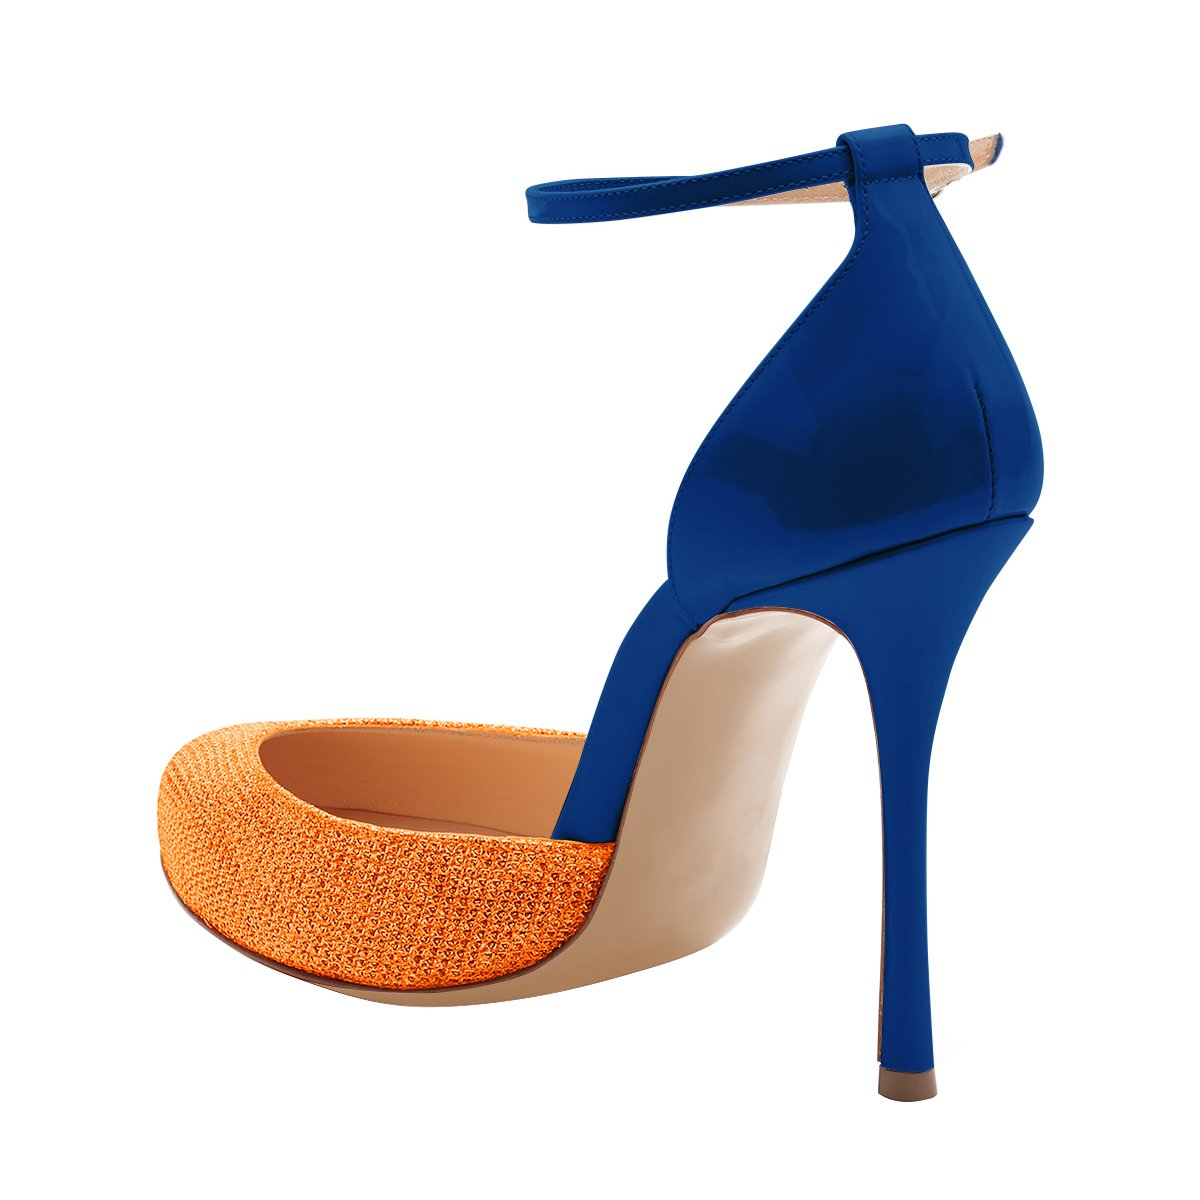 FSJ Women Fashion Almond Toe Ankle Strap D'Orsay Pumps High Heels Party Prom Sandals Size 4-15 US B0781W998M 7 B(M) US|Blue